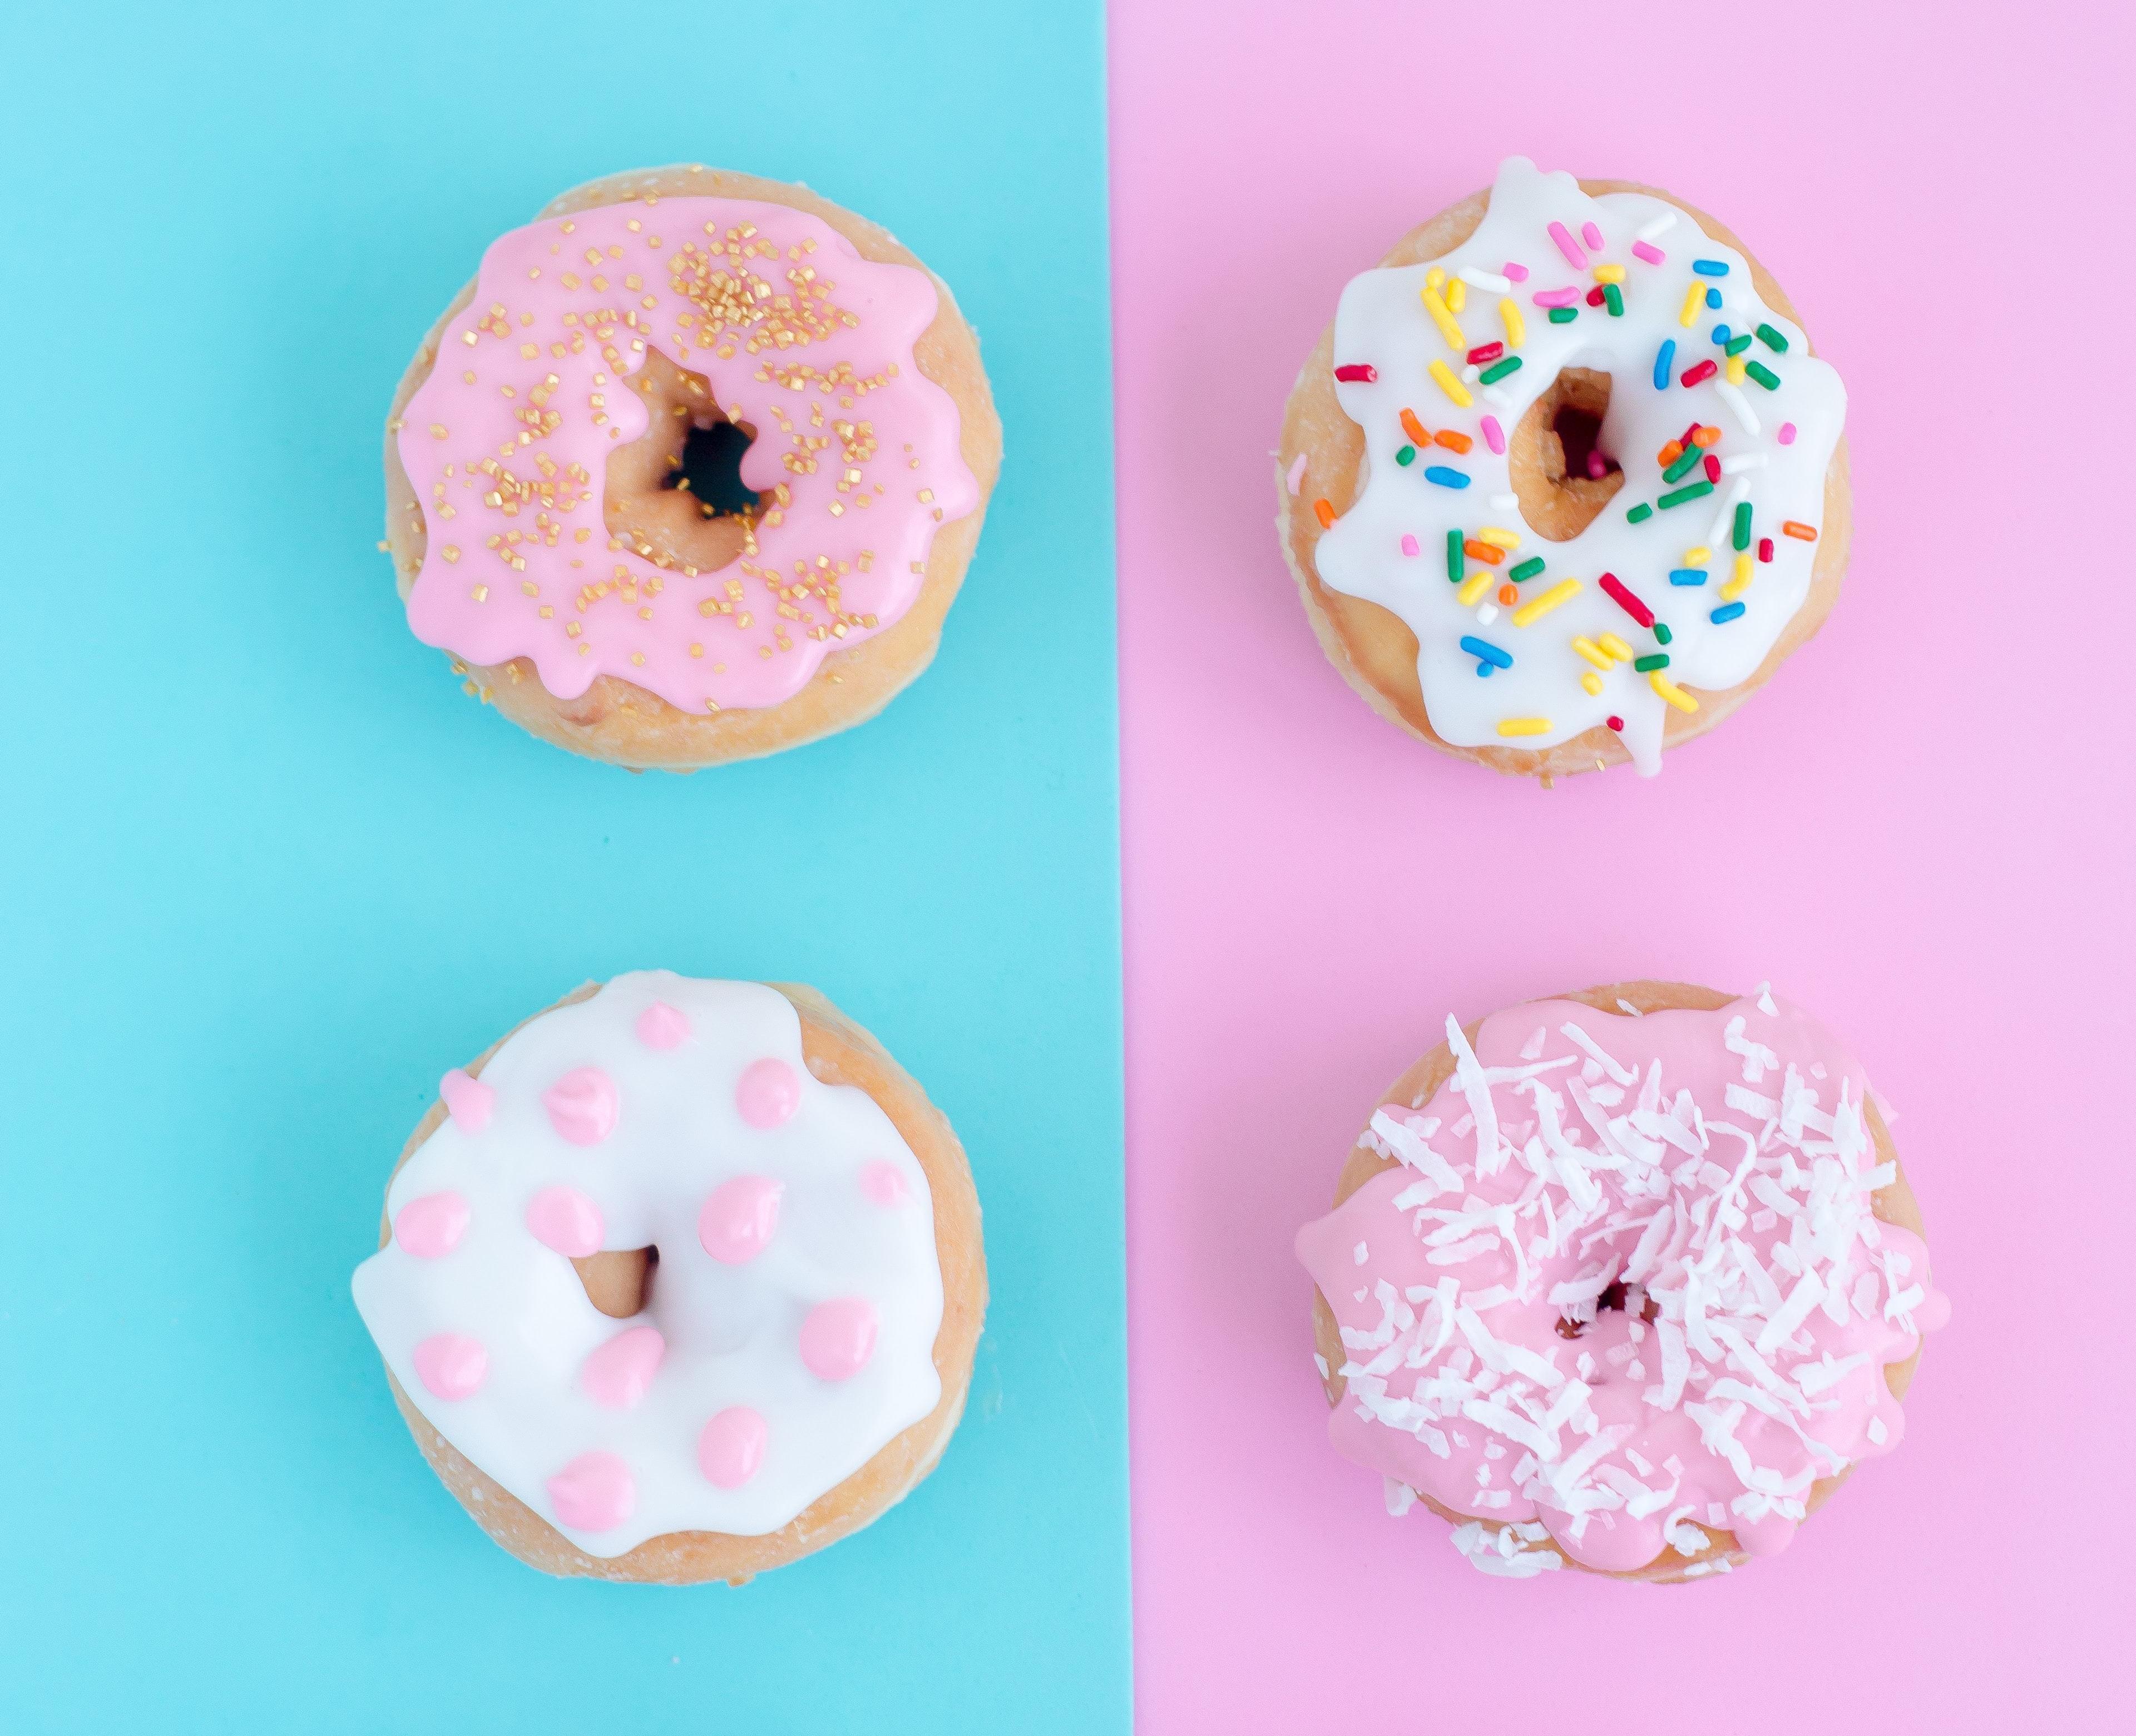 Sugar in the body